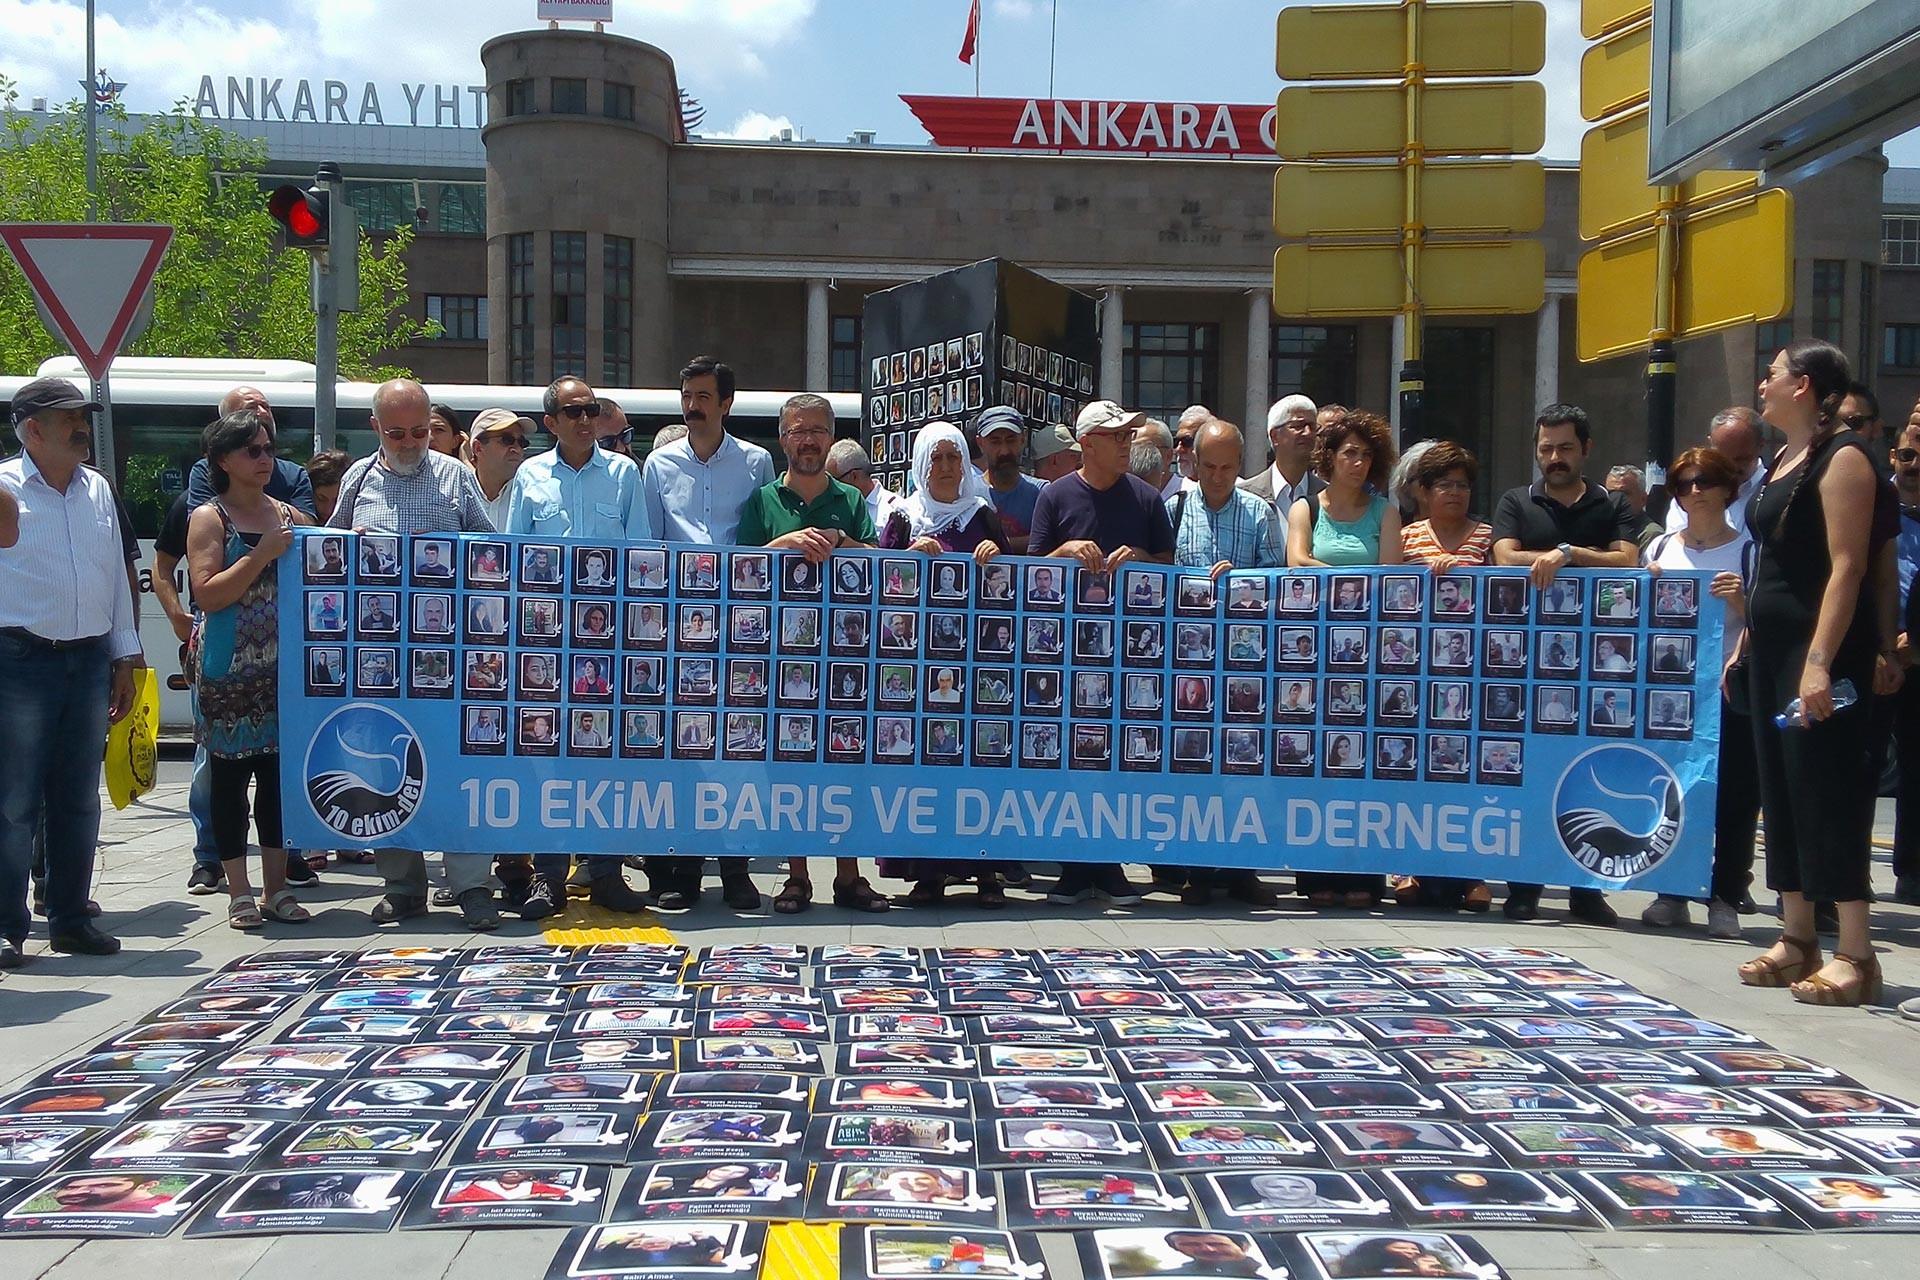 10 Ekim Katliamı'nda 'insanlığa karşı suç' tespiti